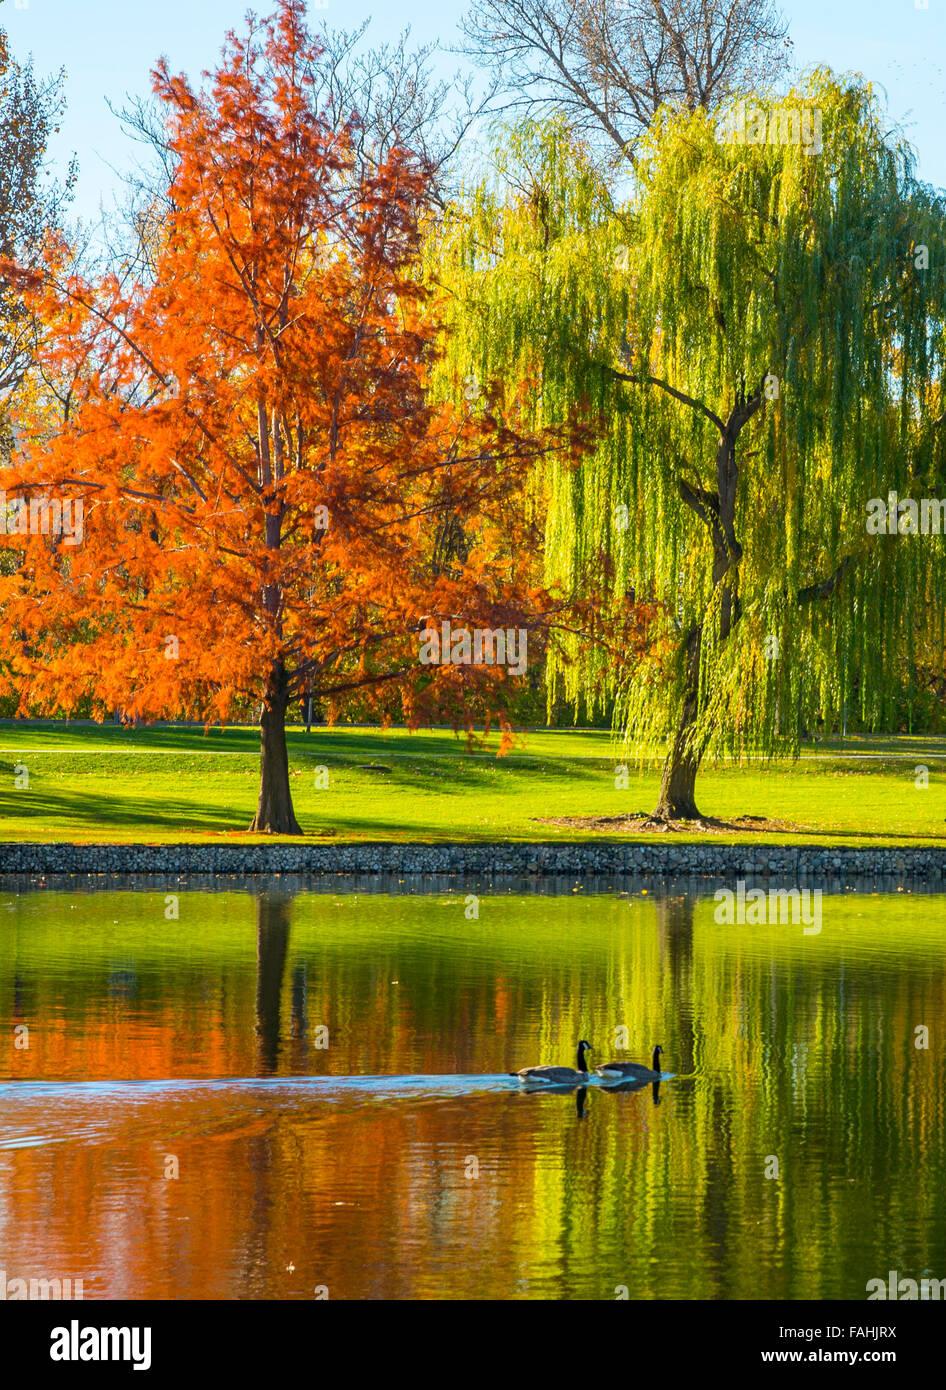 Canadian Geese swimming through Autumn water reflections. Julia Davis Park Pond. Boise River Greenbelt, Boise, Idaho, - Stock Image